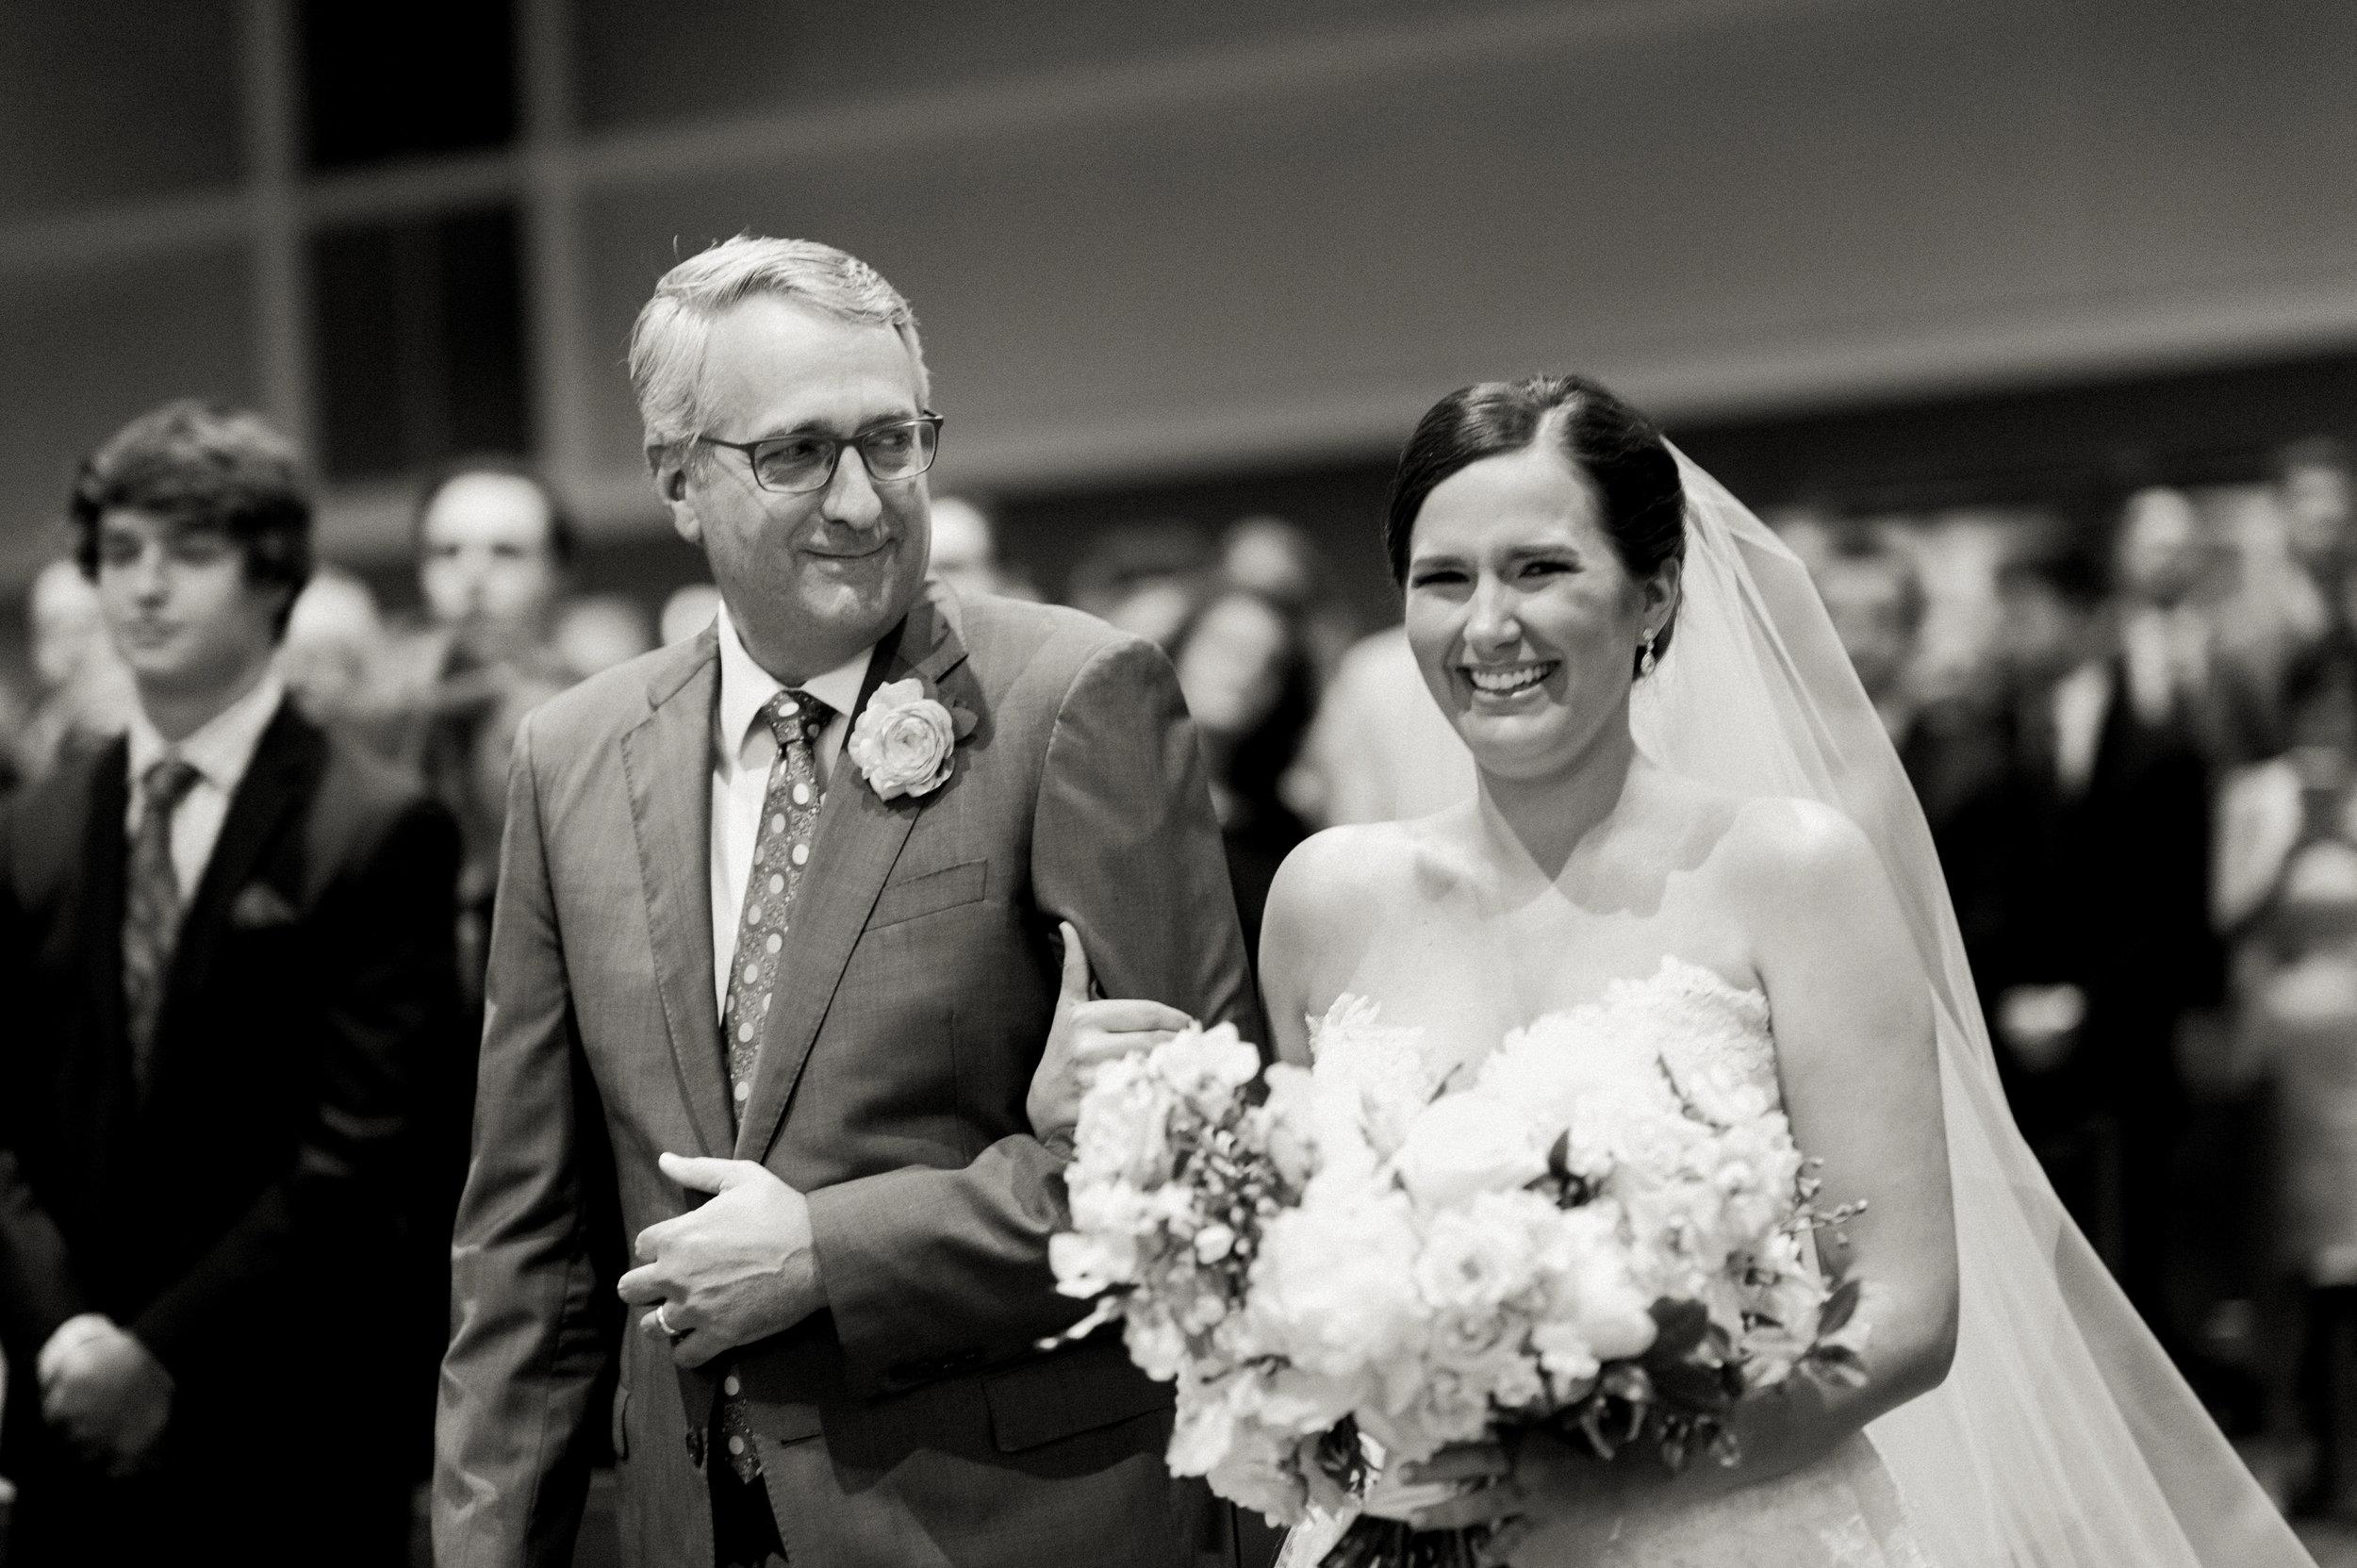 McElravey_Wedding_CarolineLimaPhotography_2018_108.jpg